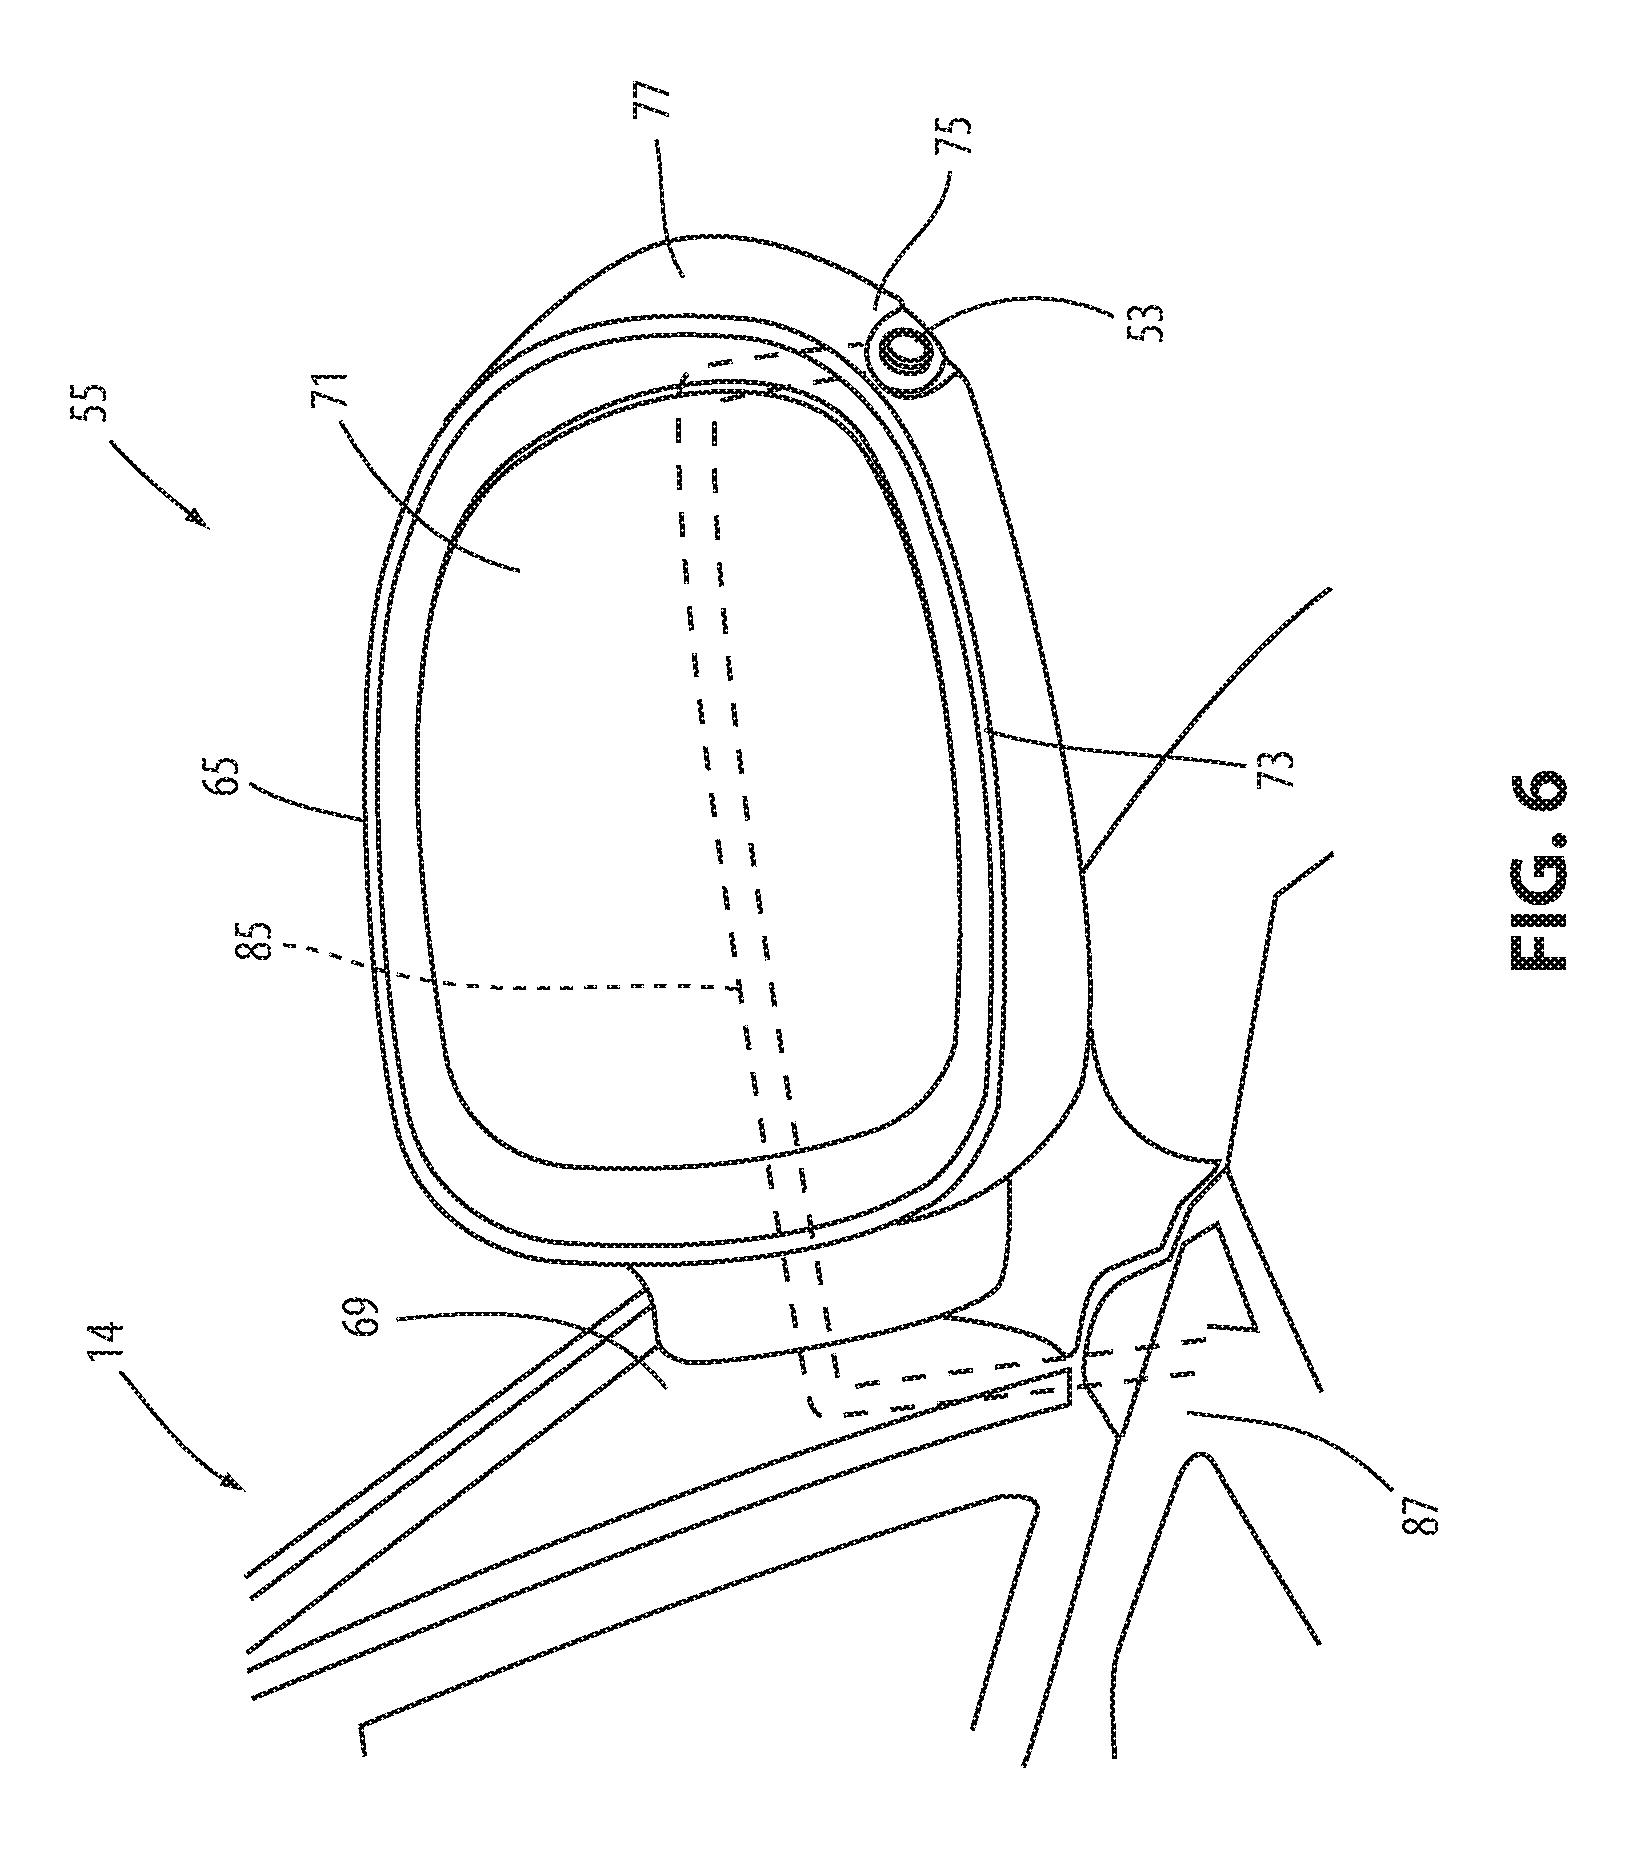 patent us 9 836 060 b2 F150 Tailgate Parts patent